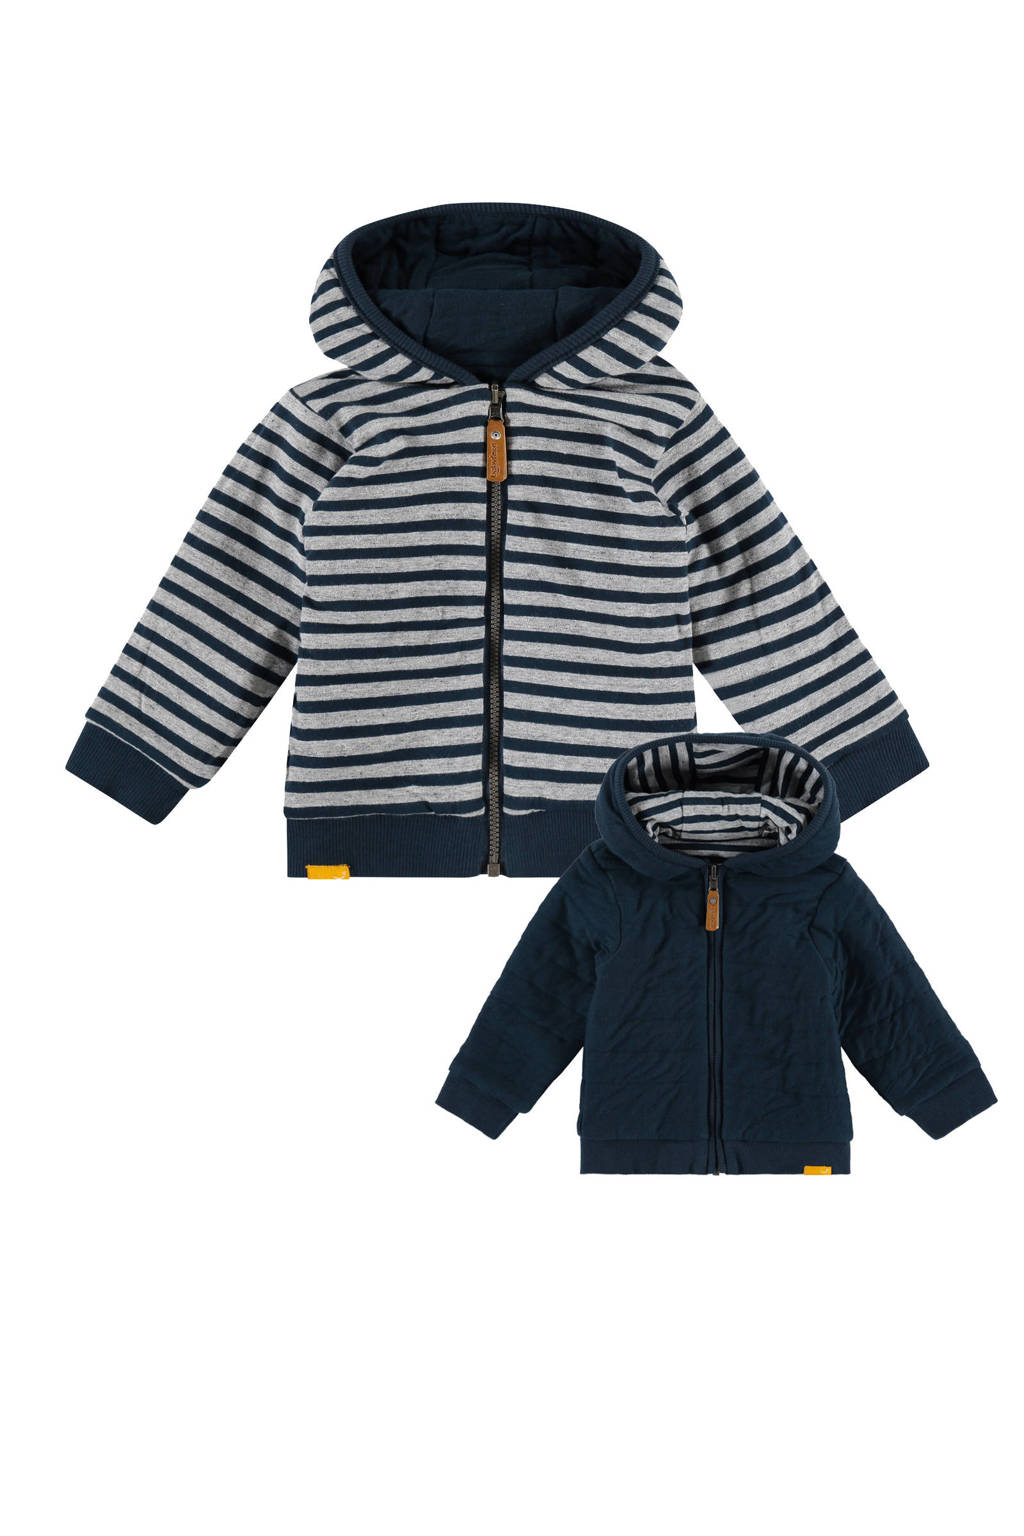 Babyface baby gestreepte reversible winterjas donkerblauw/lichtgrijs melange, Donkerblauw/lichtgrijs melange